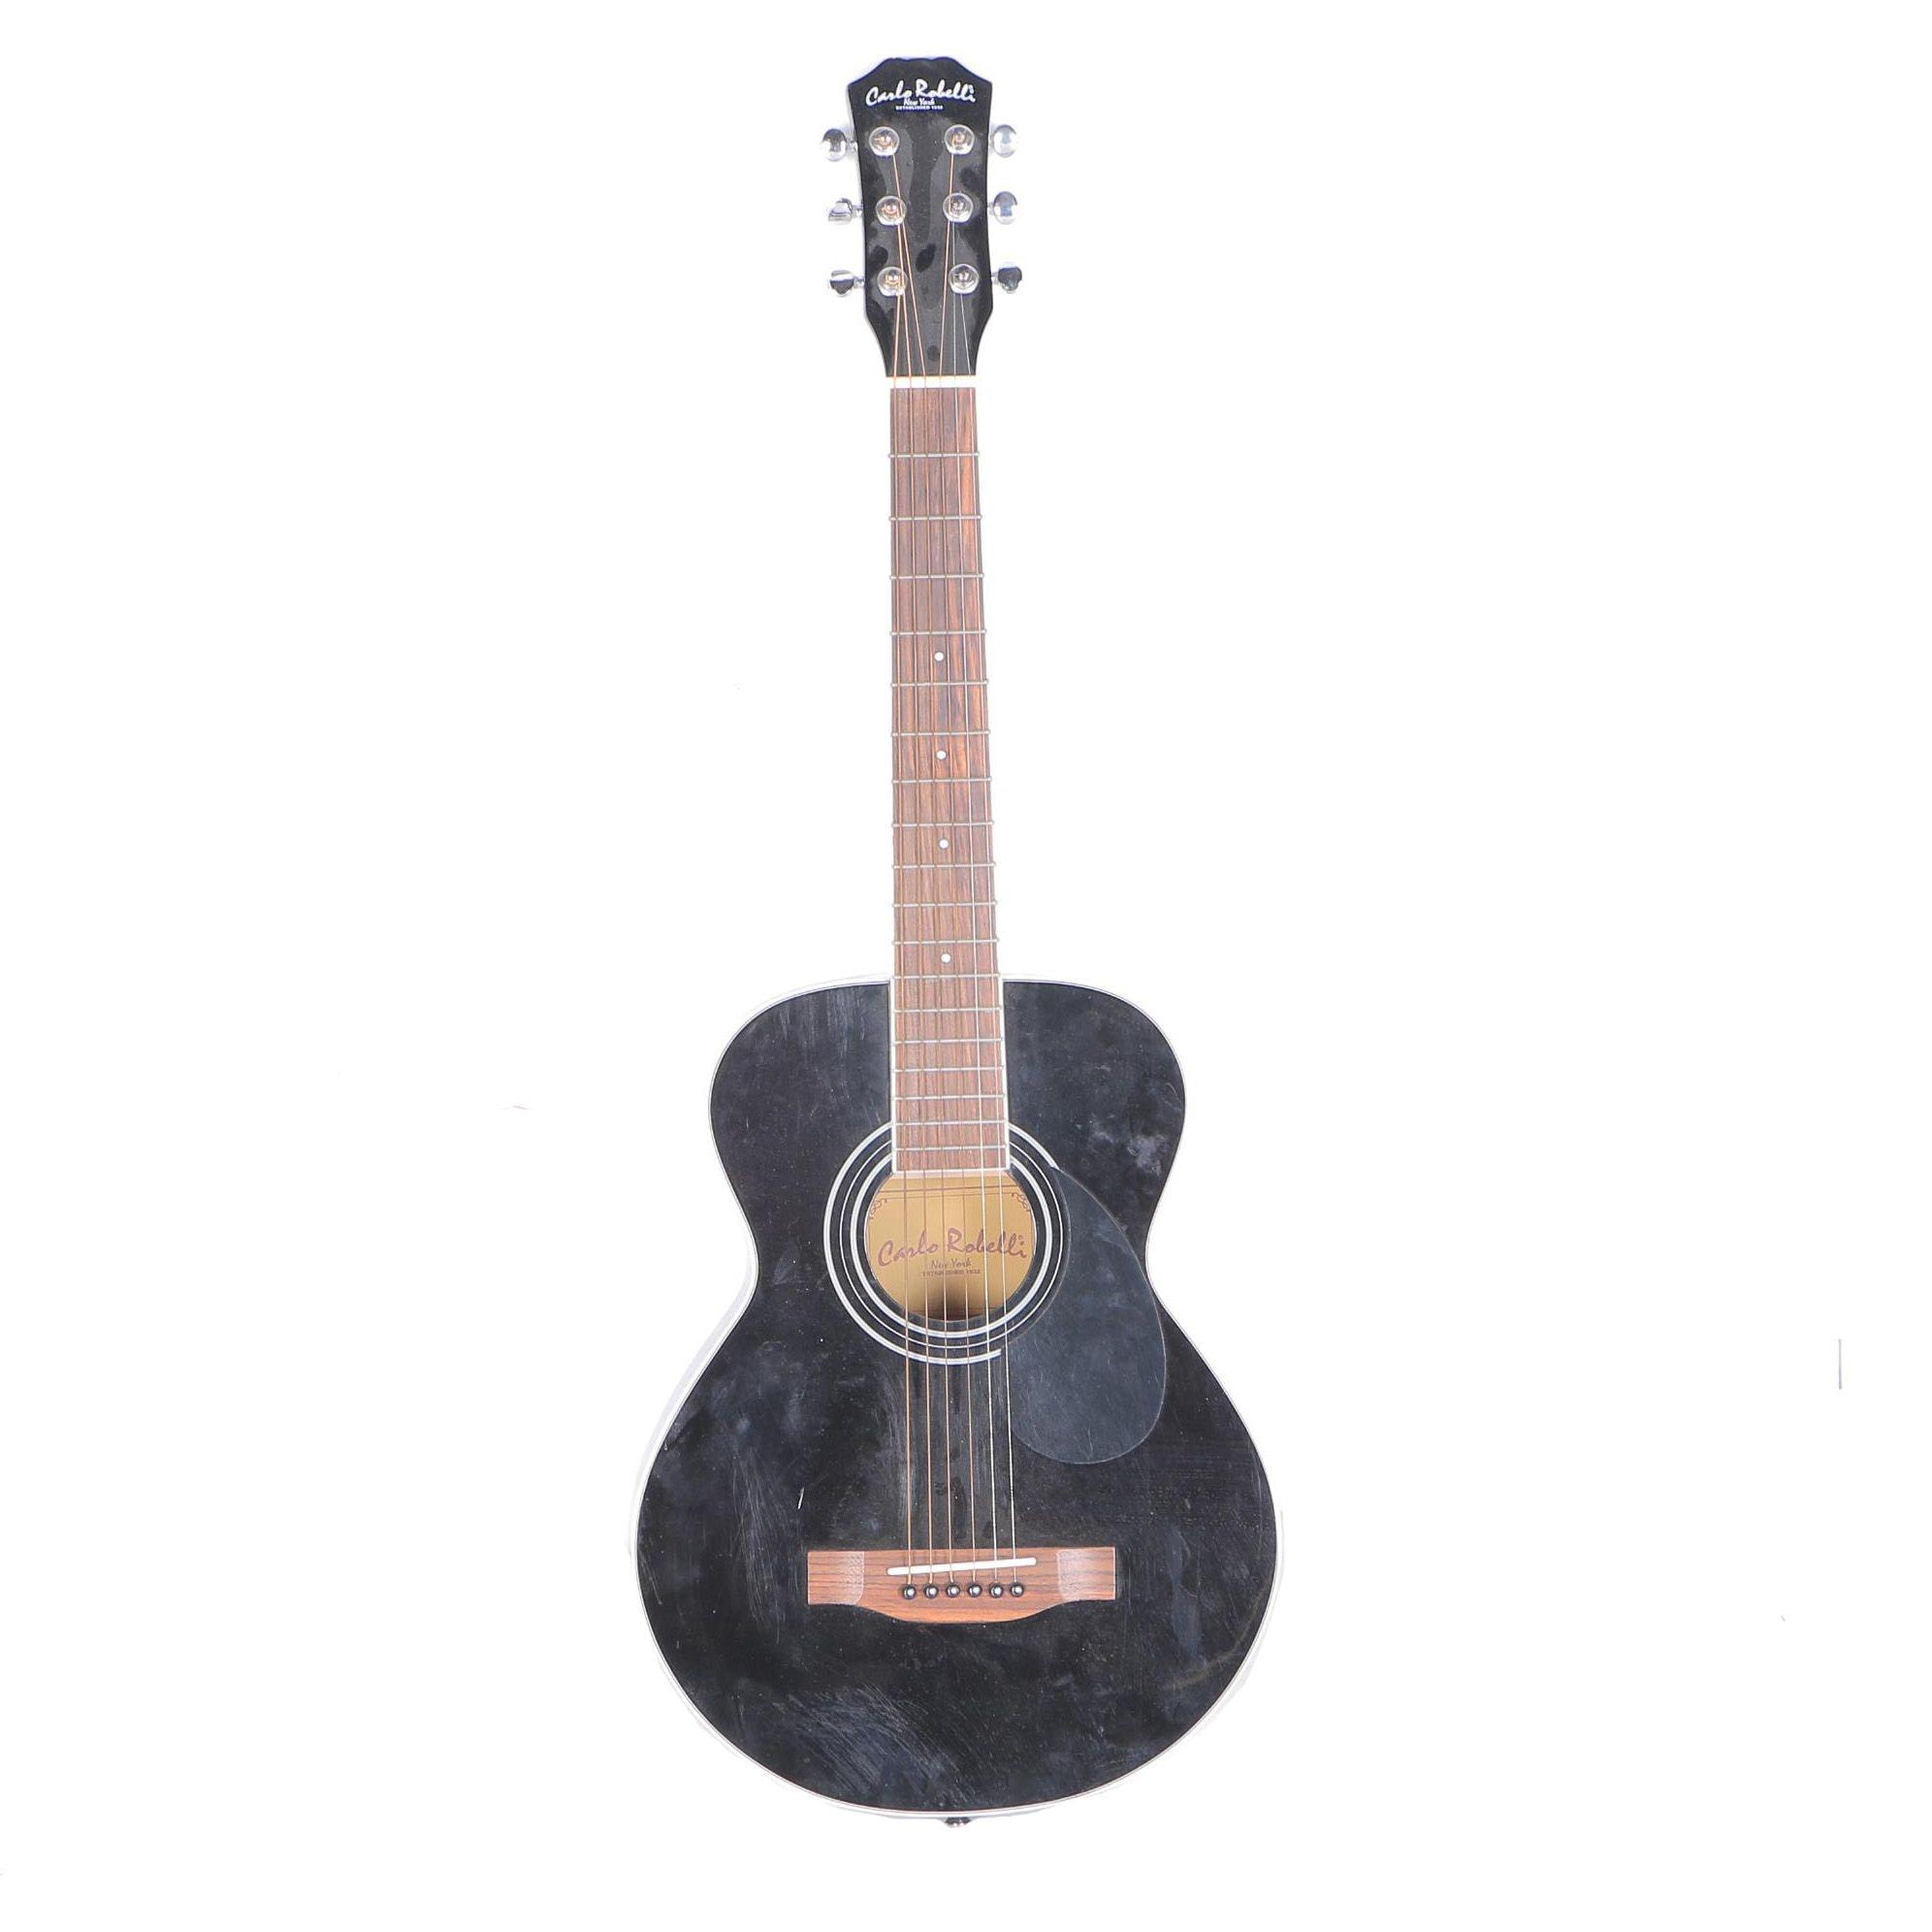 Small-Scale Carlo Robelli Acoustic Guitar